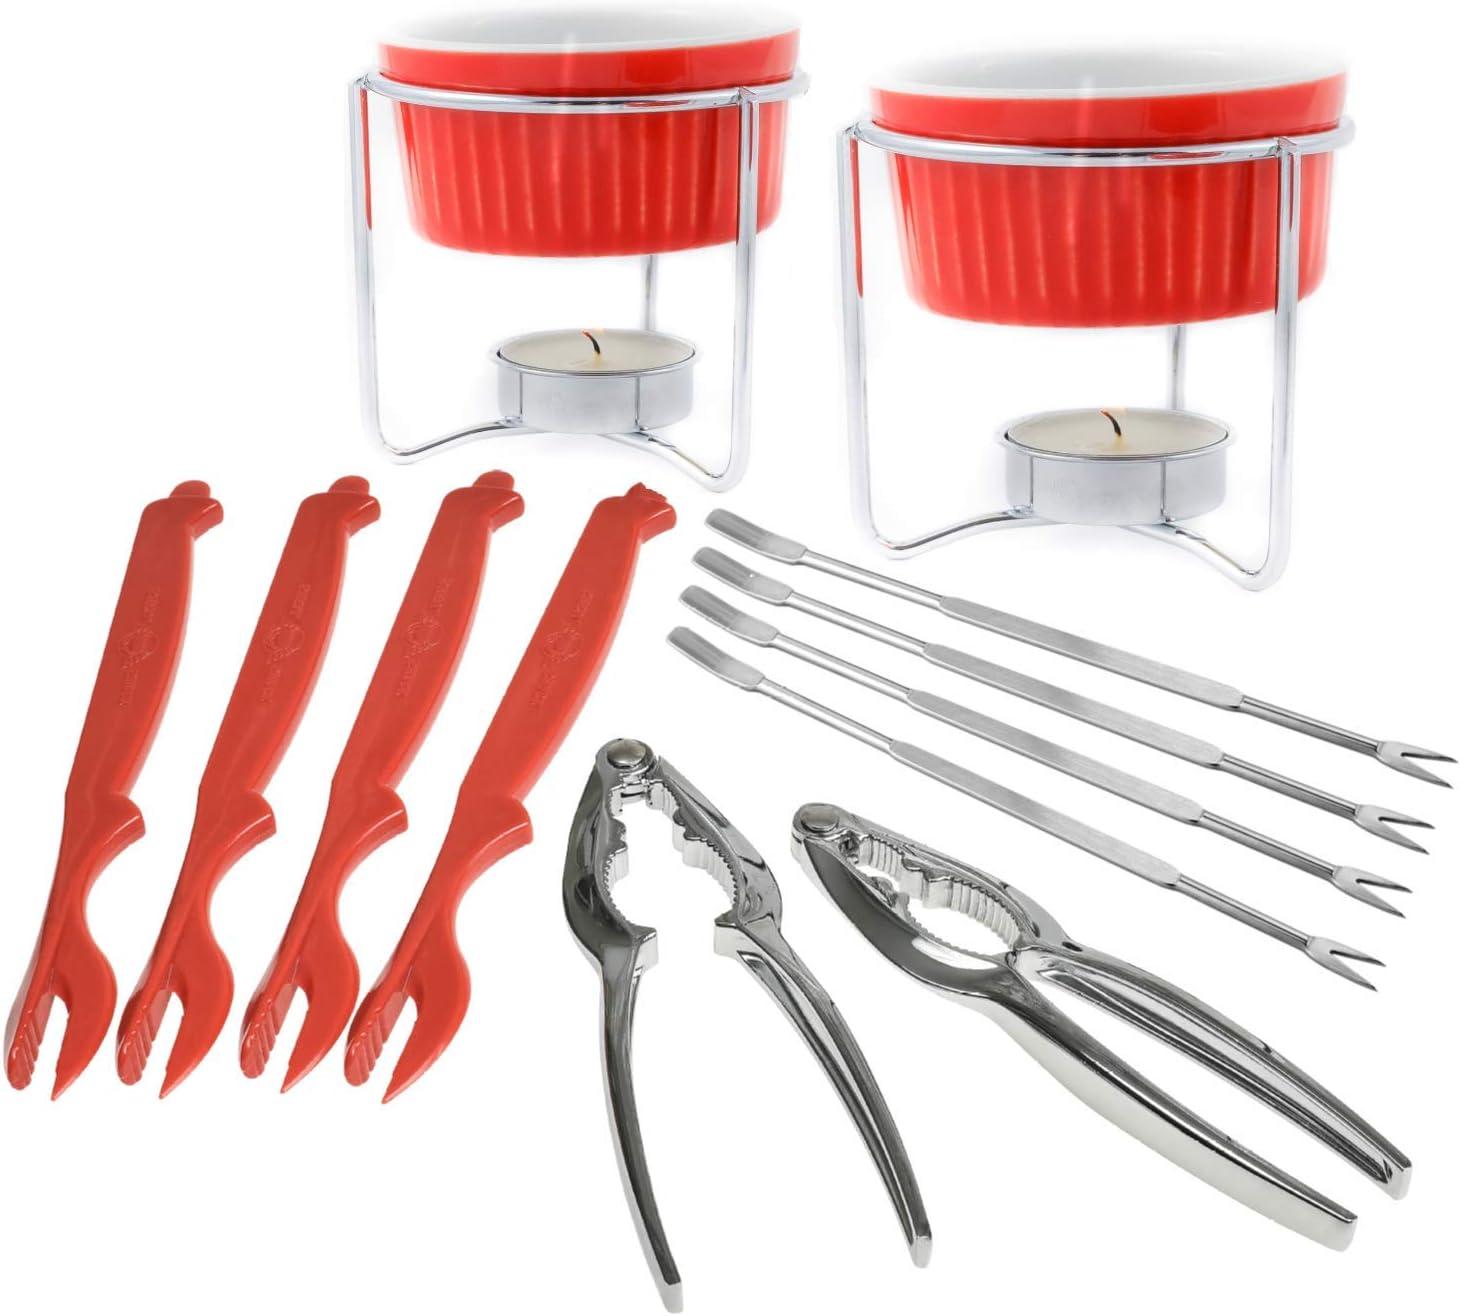 Crabaholik Seafood Tools Price reduction Set: 12pcs Utensils K Inventory cleanup selling sale Cracking Crab Leg